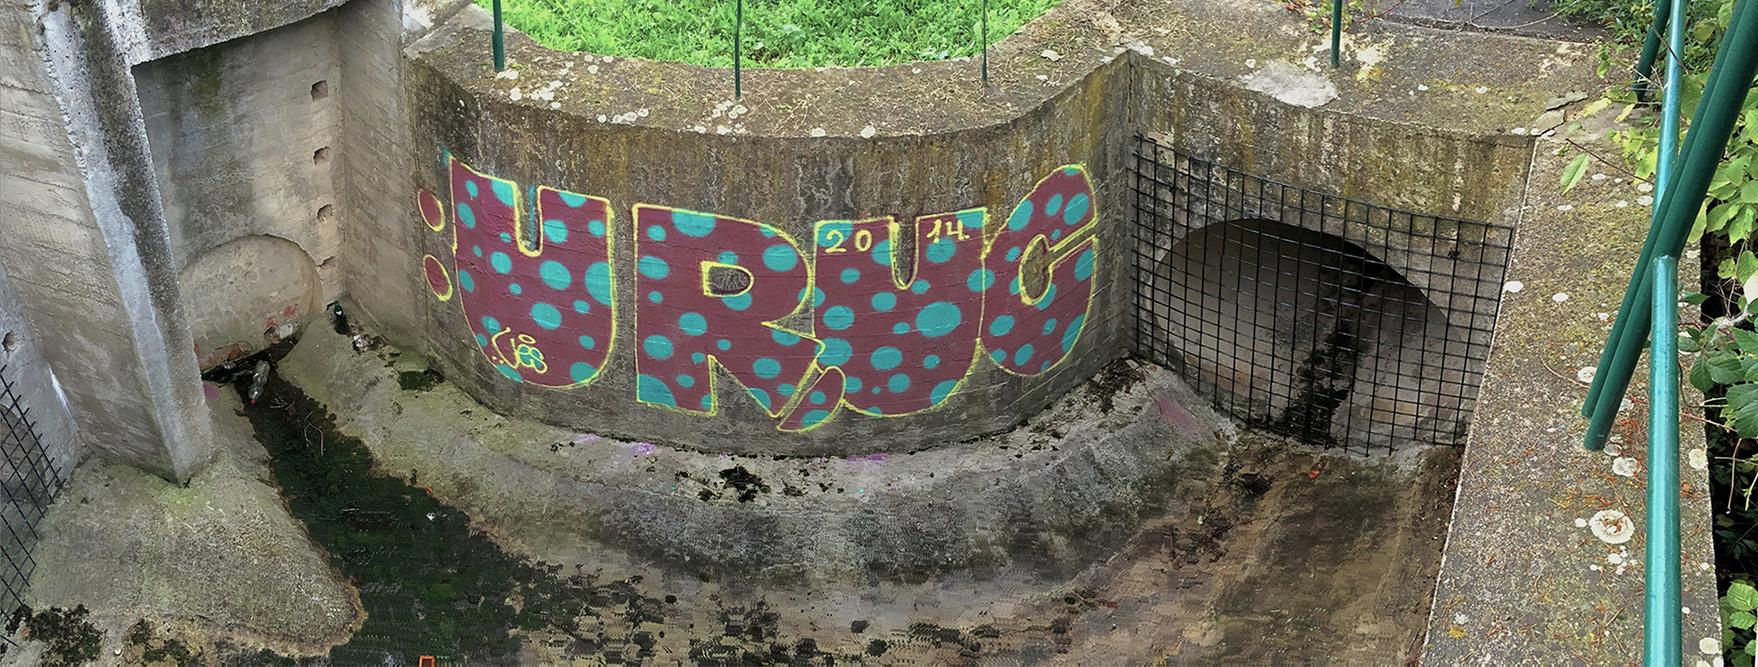 LES_Uruk_Empty_Graffiti_Spraydaily_002